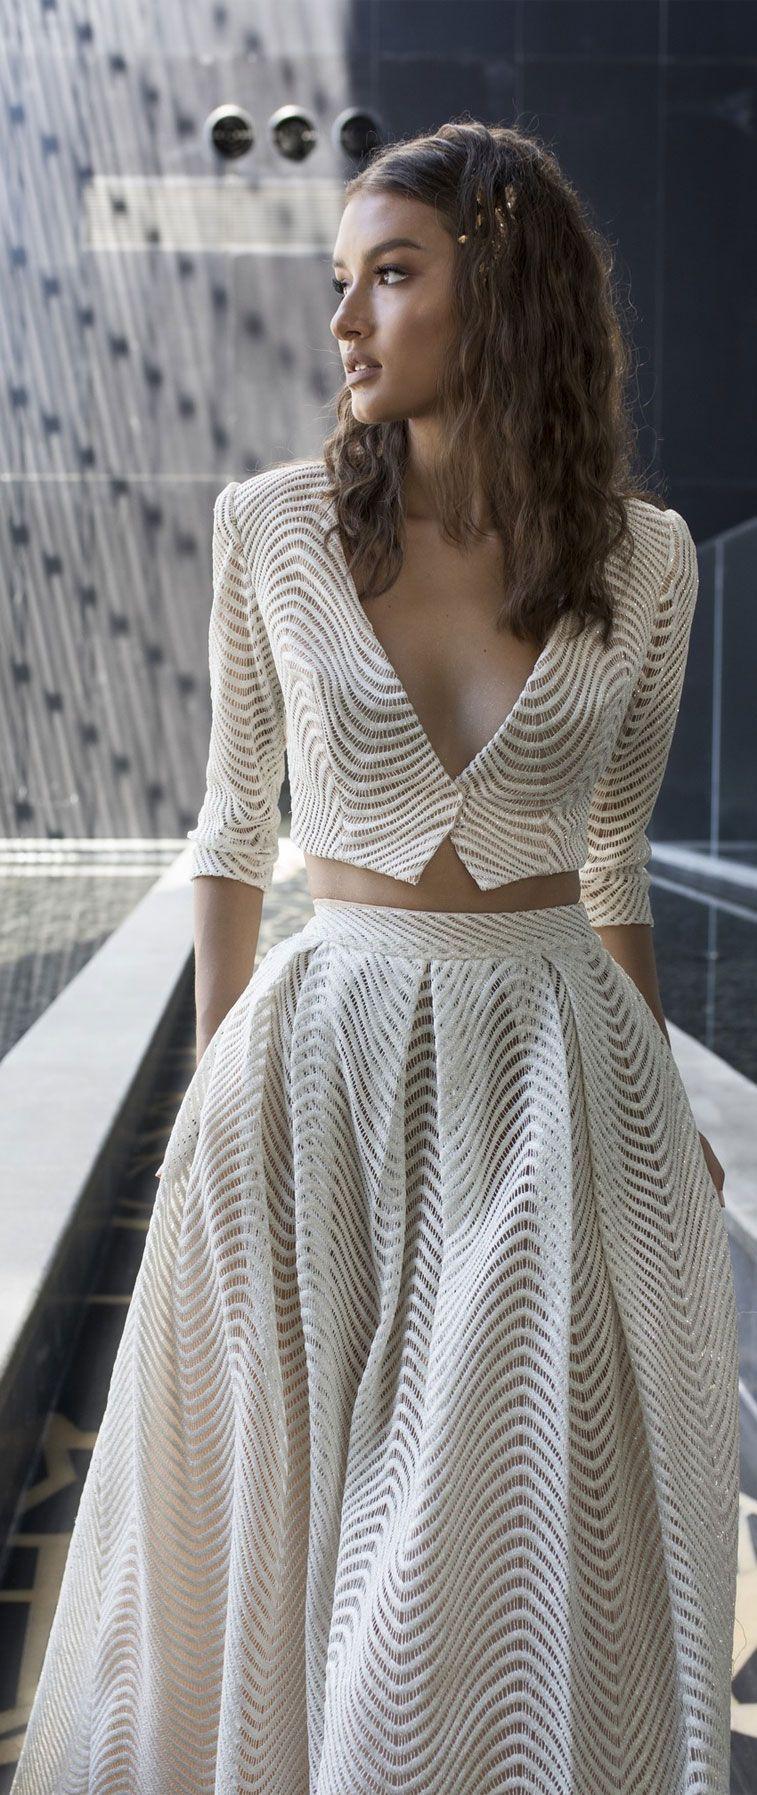 Two piece 3/4 length sleeves a line wedding dress with pockets : Dimitrius DaliaWedding Dress - Diamond Bridal Collection #weddingideas #weddinginspiration #weddingdress #weddinggown #weddingdress #bridedress